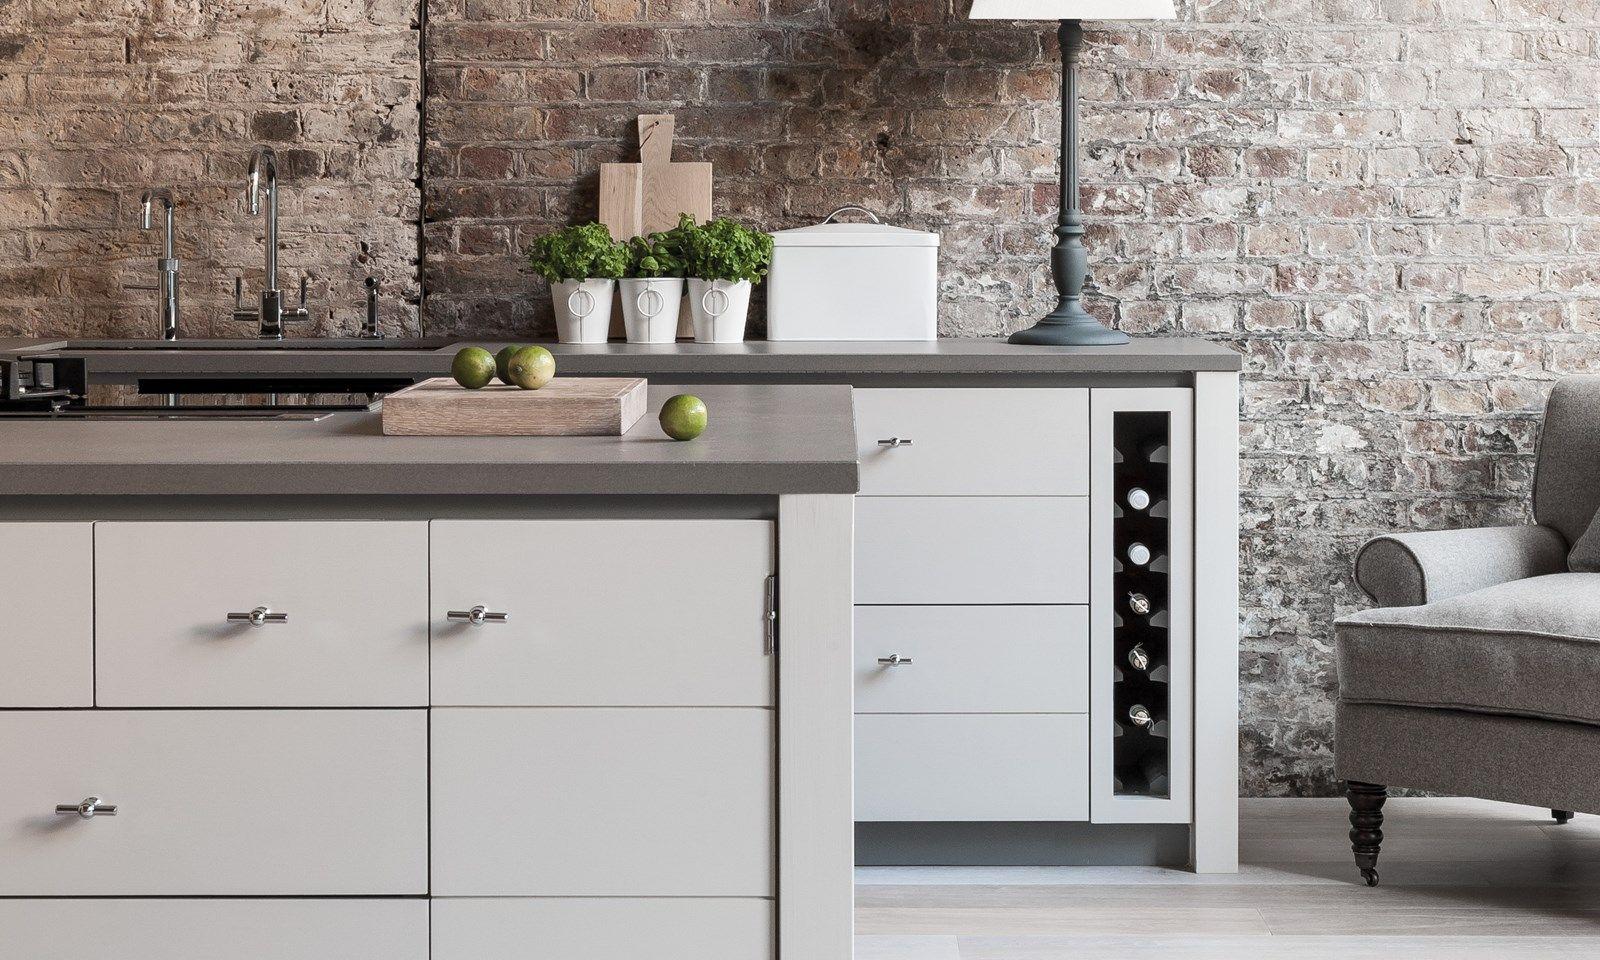 Küchenideen land limehouse kitchen  neptune  house  pinterest  modern interiors